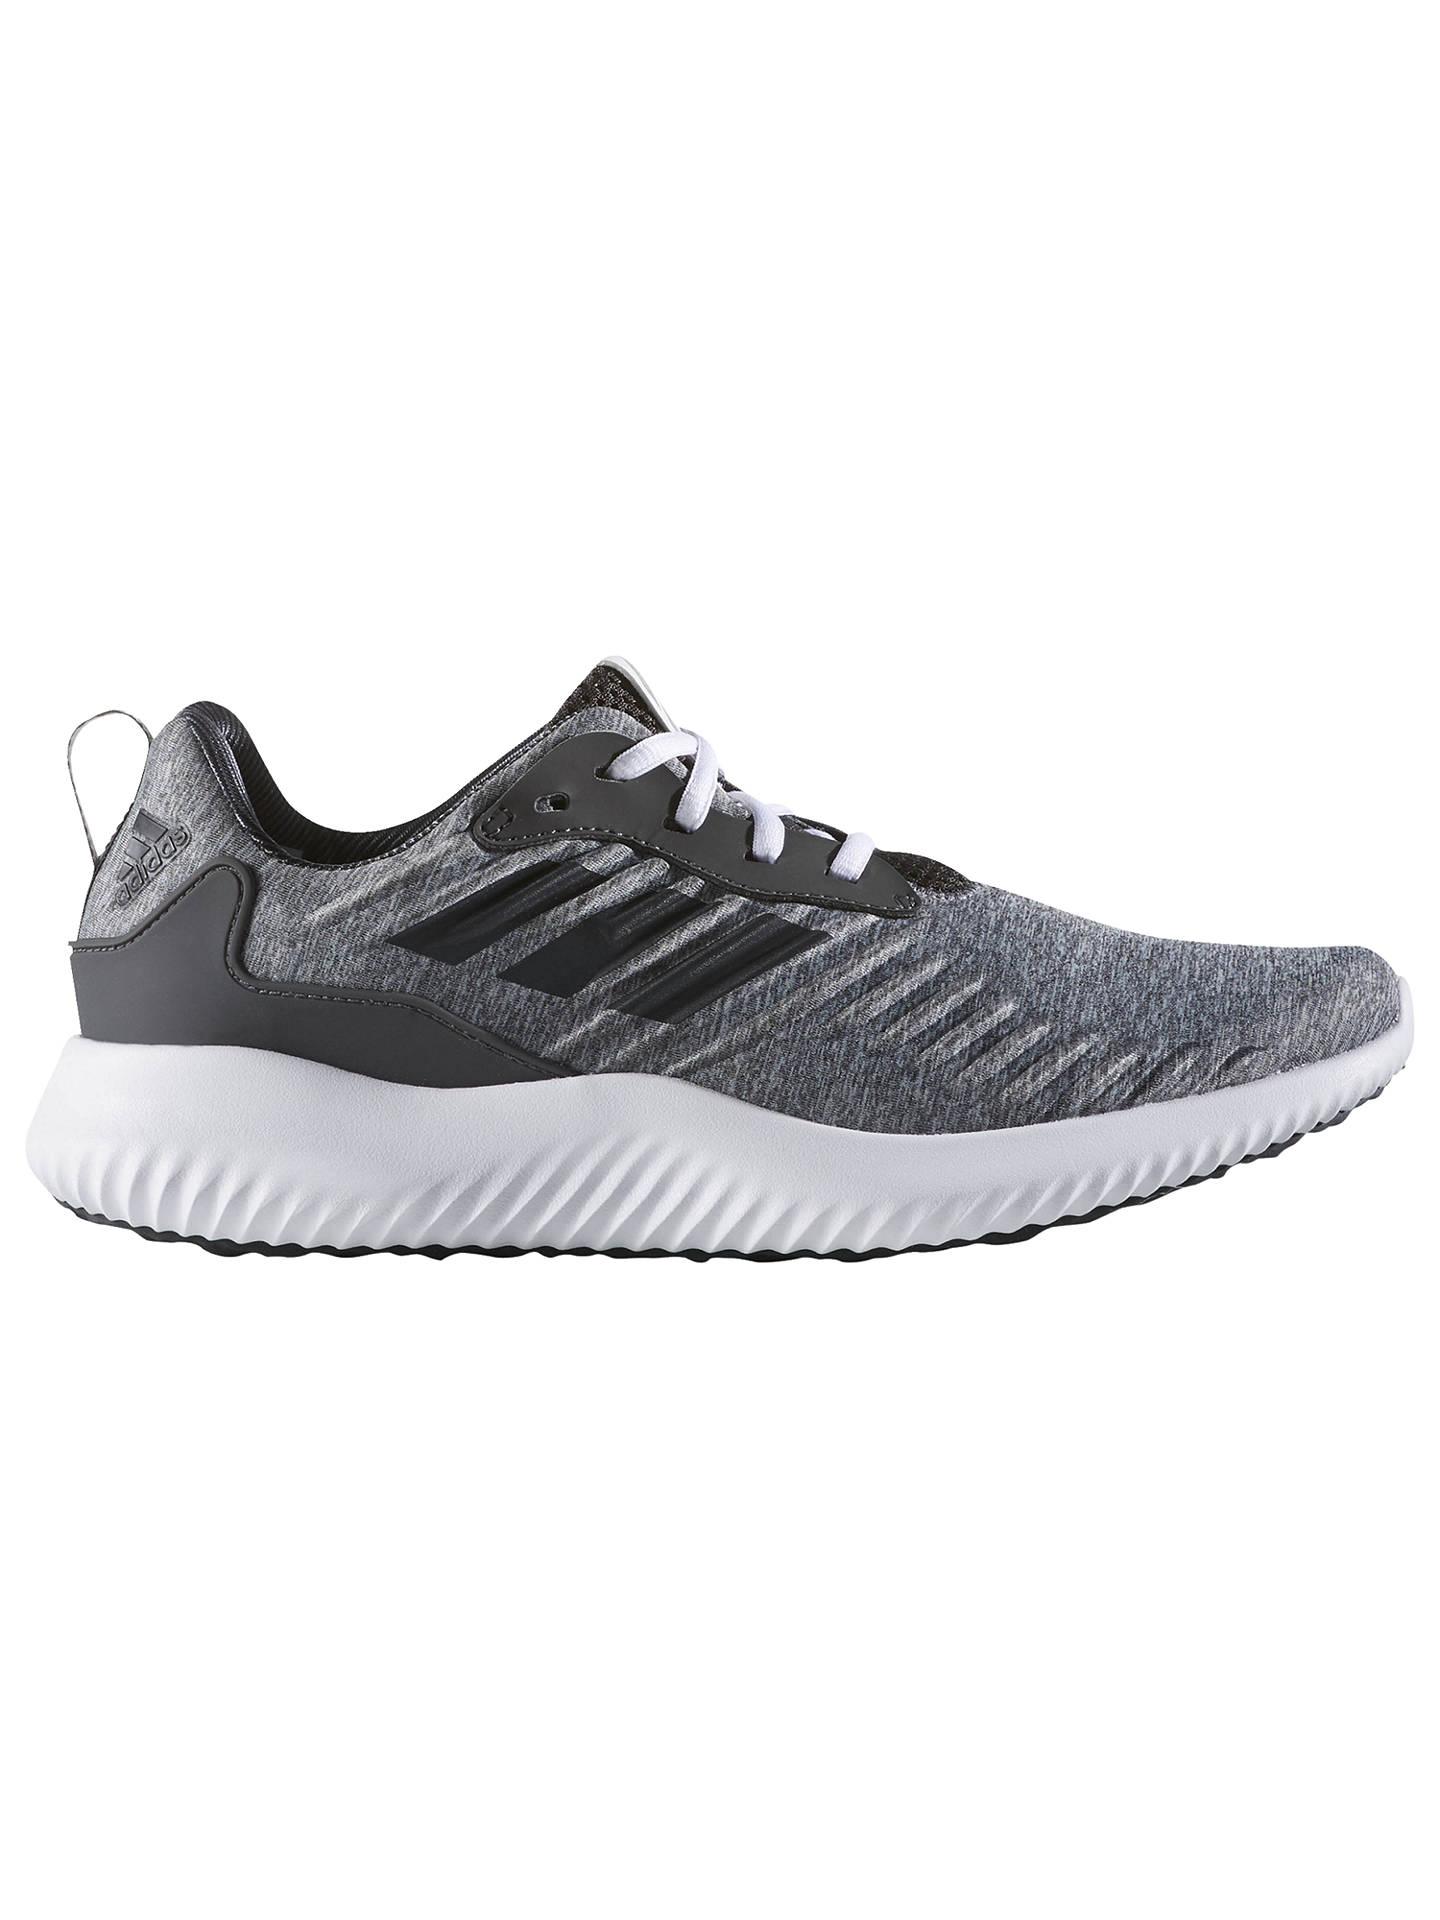 huge selection of 28c2c c6bdb BuyAdidas Alphabounce RC Mens Running Shoes, Dark Grey Heather, 7 Online  at johnlewis.